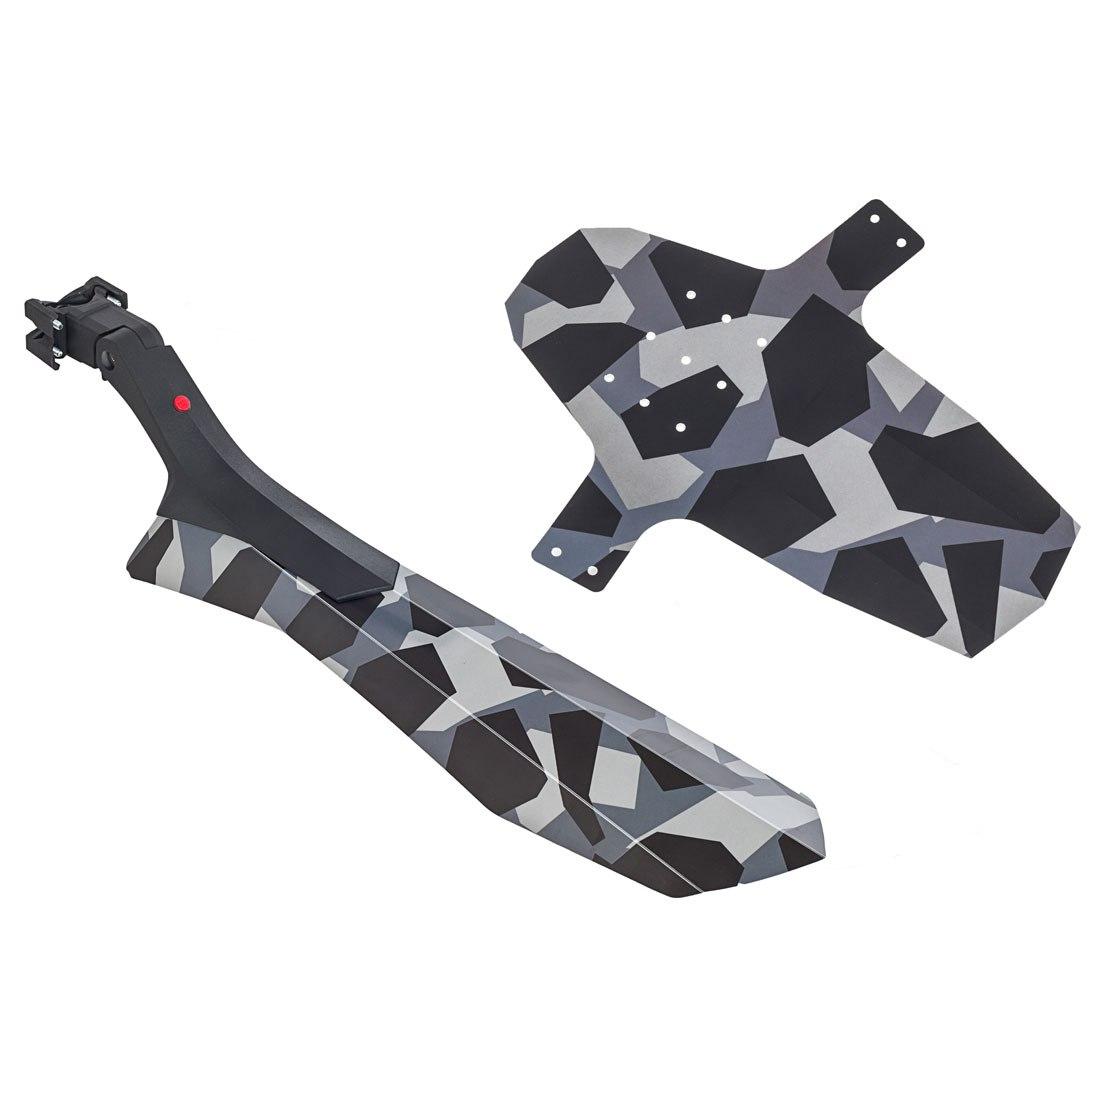 Hebie Swap Set 724 MTB/Trekking-Mudguard Set 26 Inches - 29 Inches